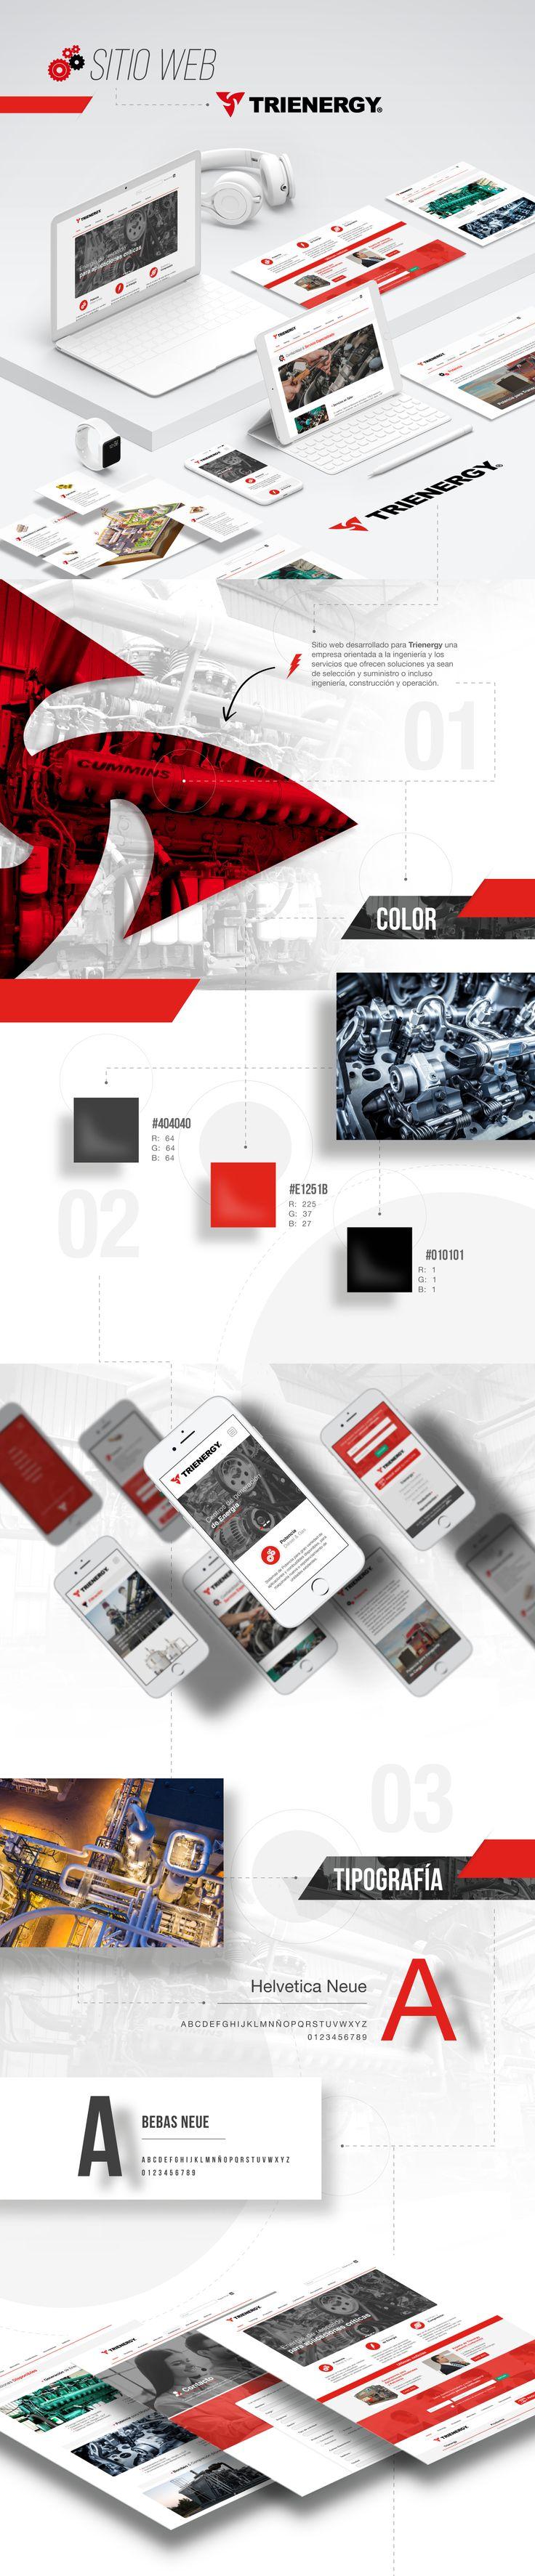 "Echa un vistazo a mi proyecto @Behance: ""SITIO WEB TRIENERGY"" https://www.behance.net/gallery/61106213/SITIO-WEB-TRIENERGY"